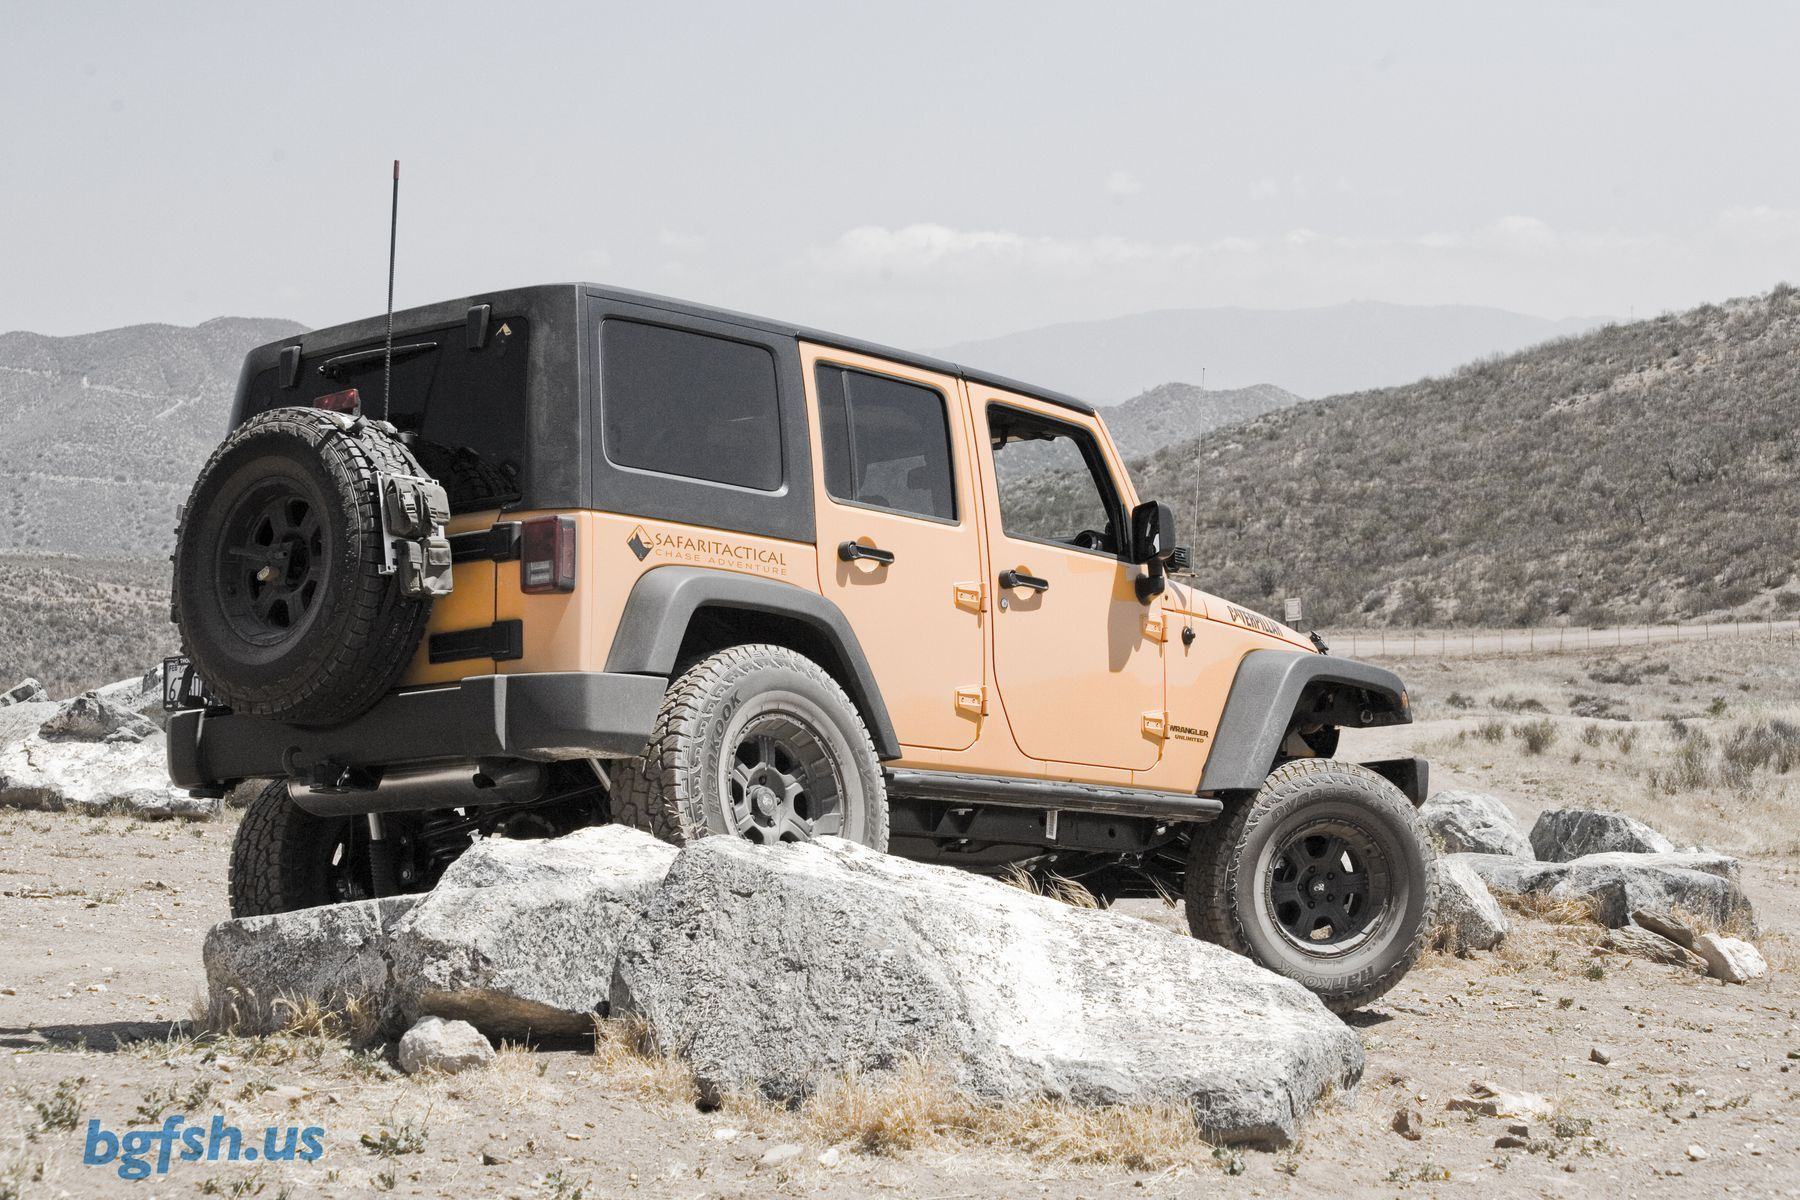 2011 Jeep Wrangler | Supercharged Jeep Wrangler